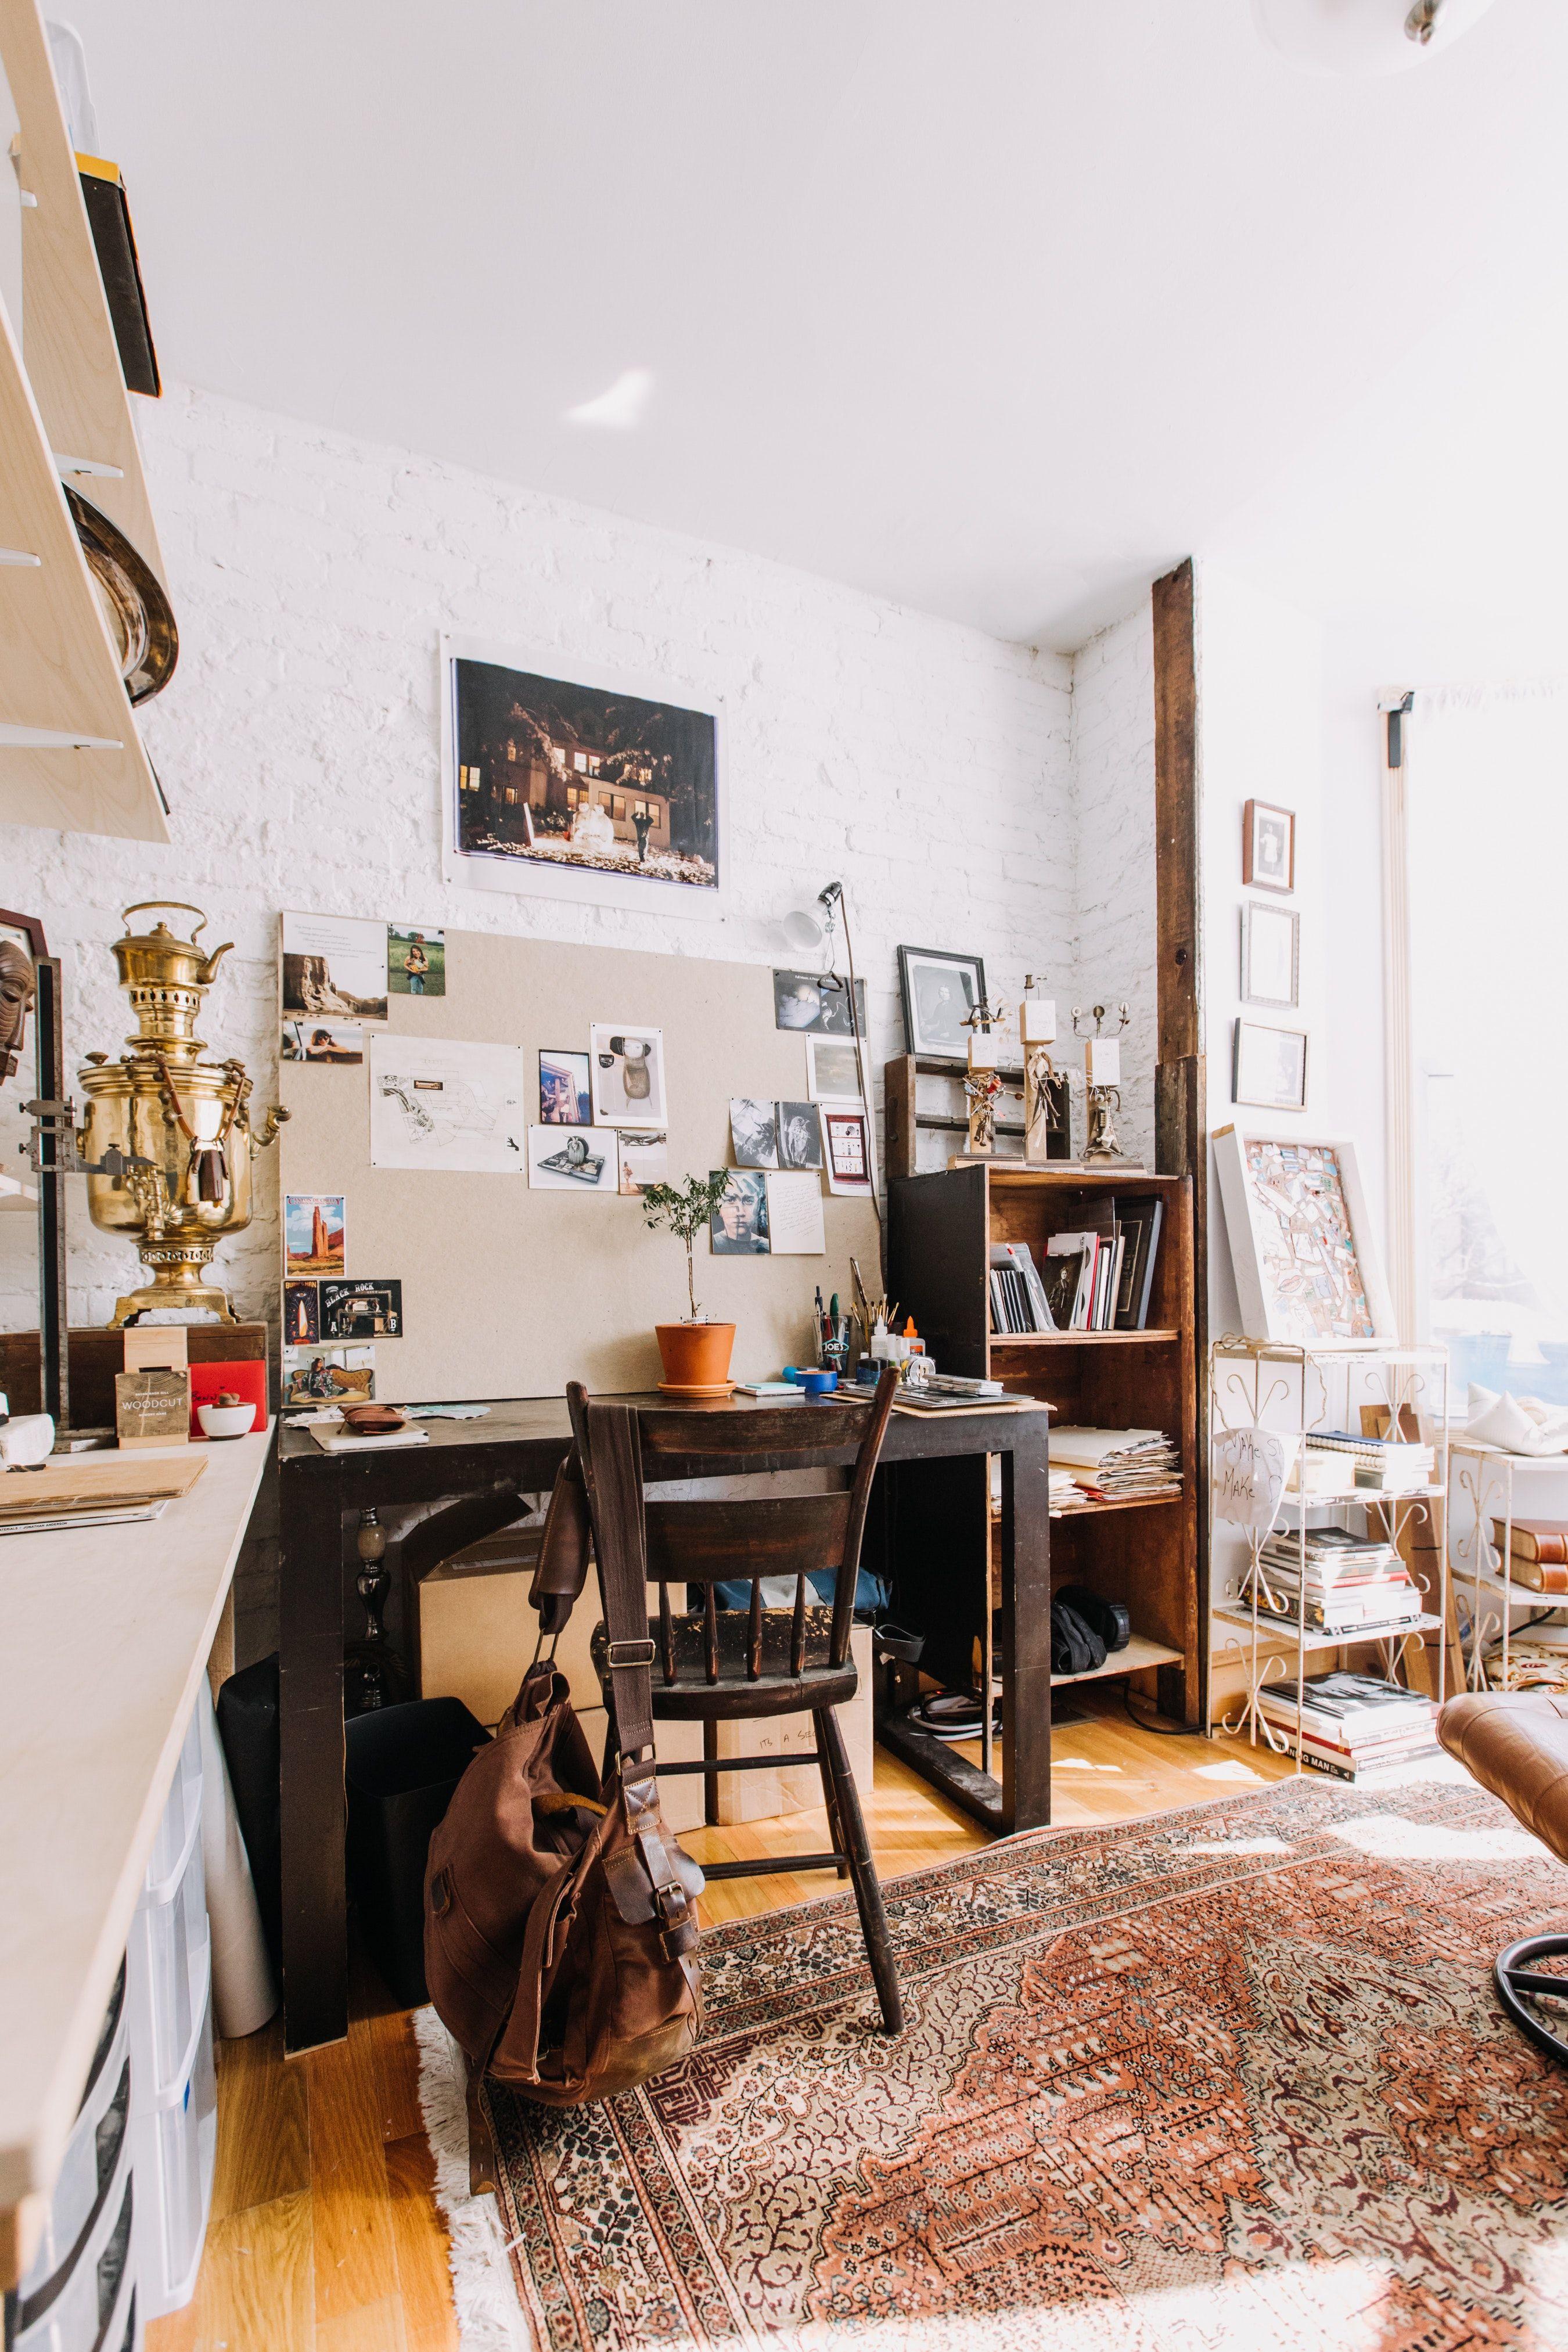 This Philadelphia Home Has Incredible Hand Built Details Small Room Design Home Room #row #home #living #room #ideas